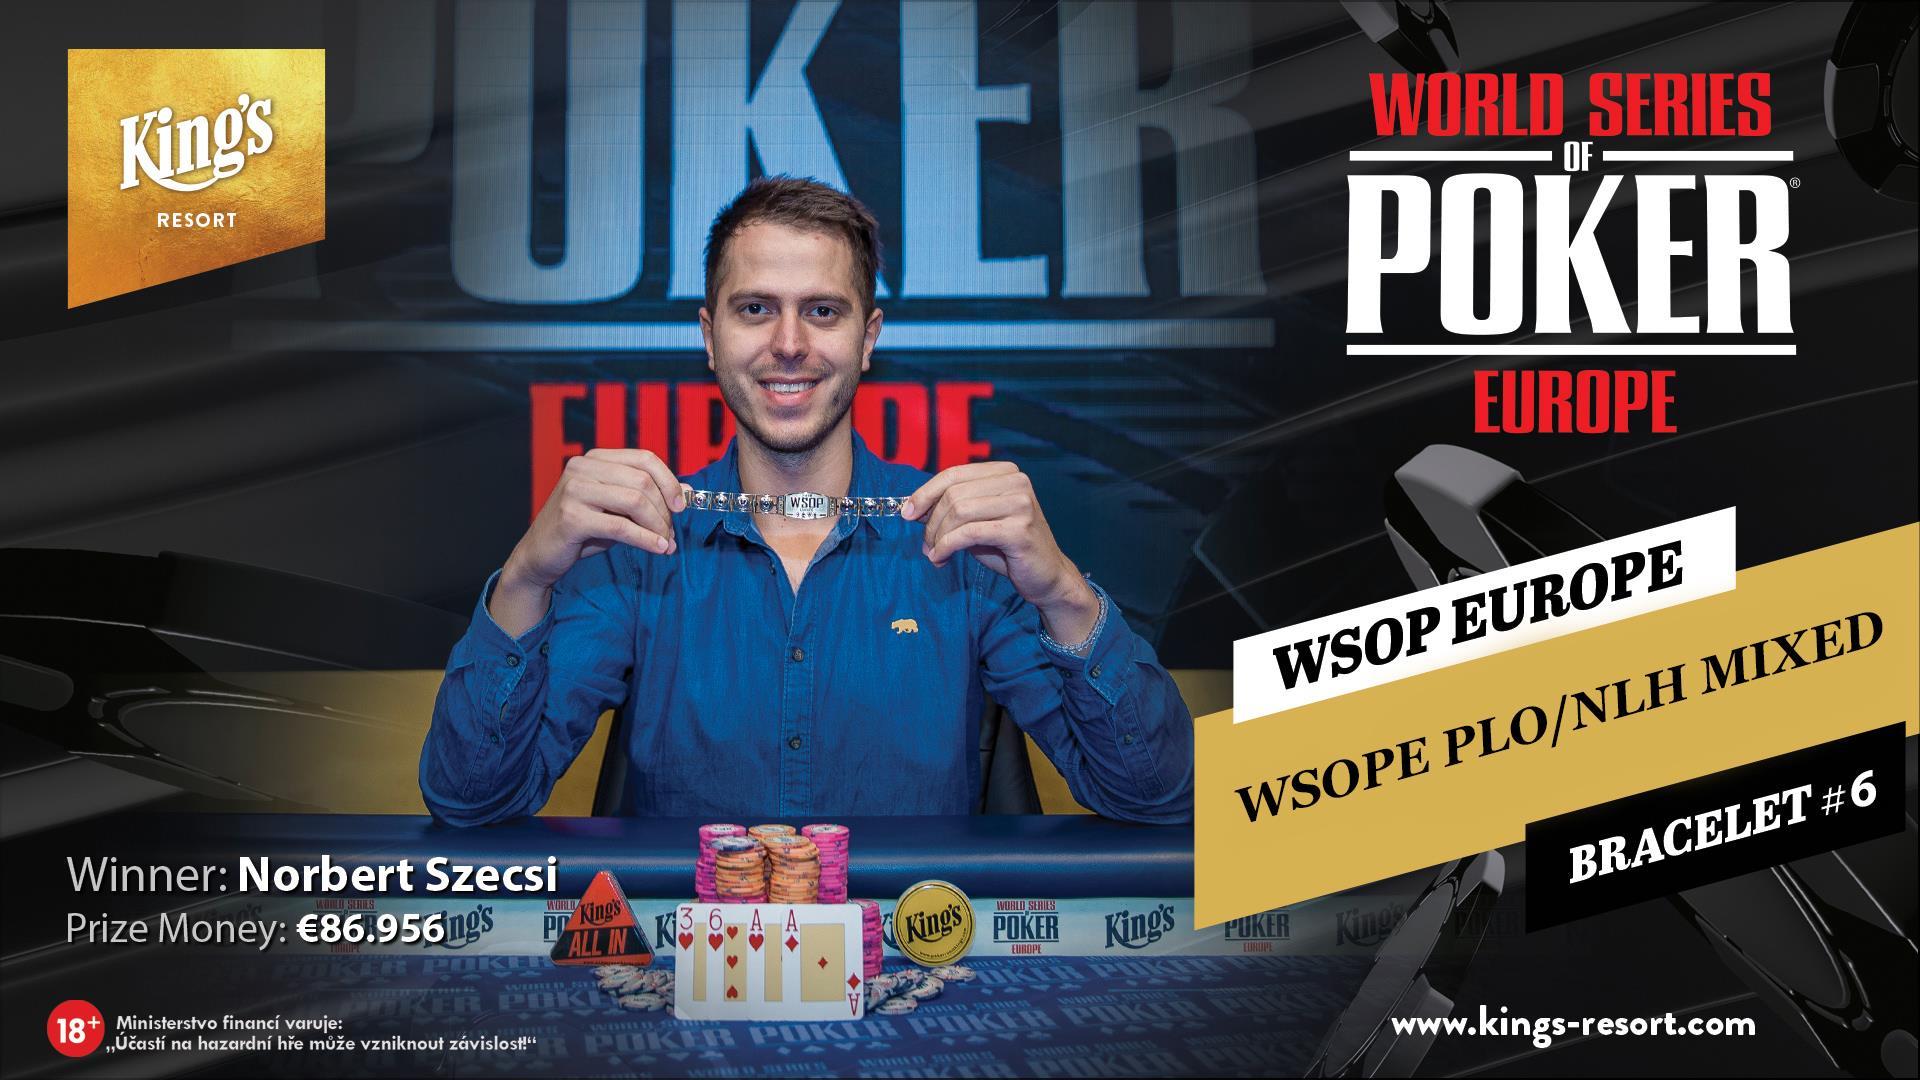 23102018winner pic WSOP Europe NLH-PLO Mixed Game Bracelet #6